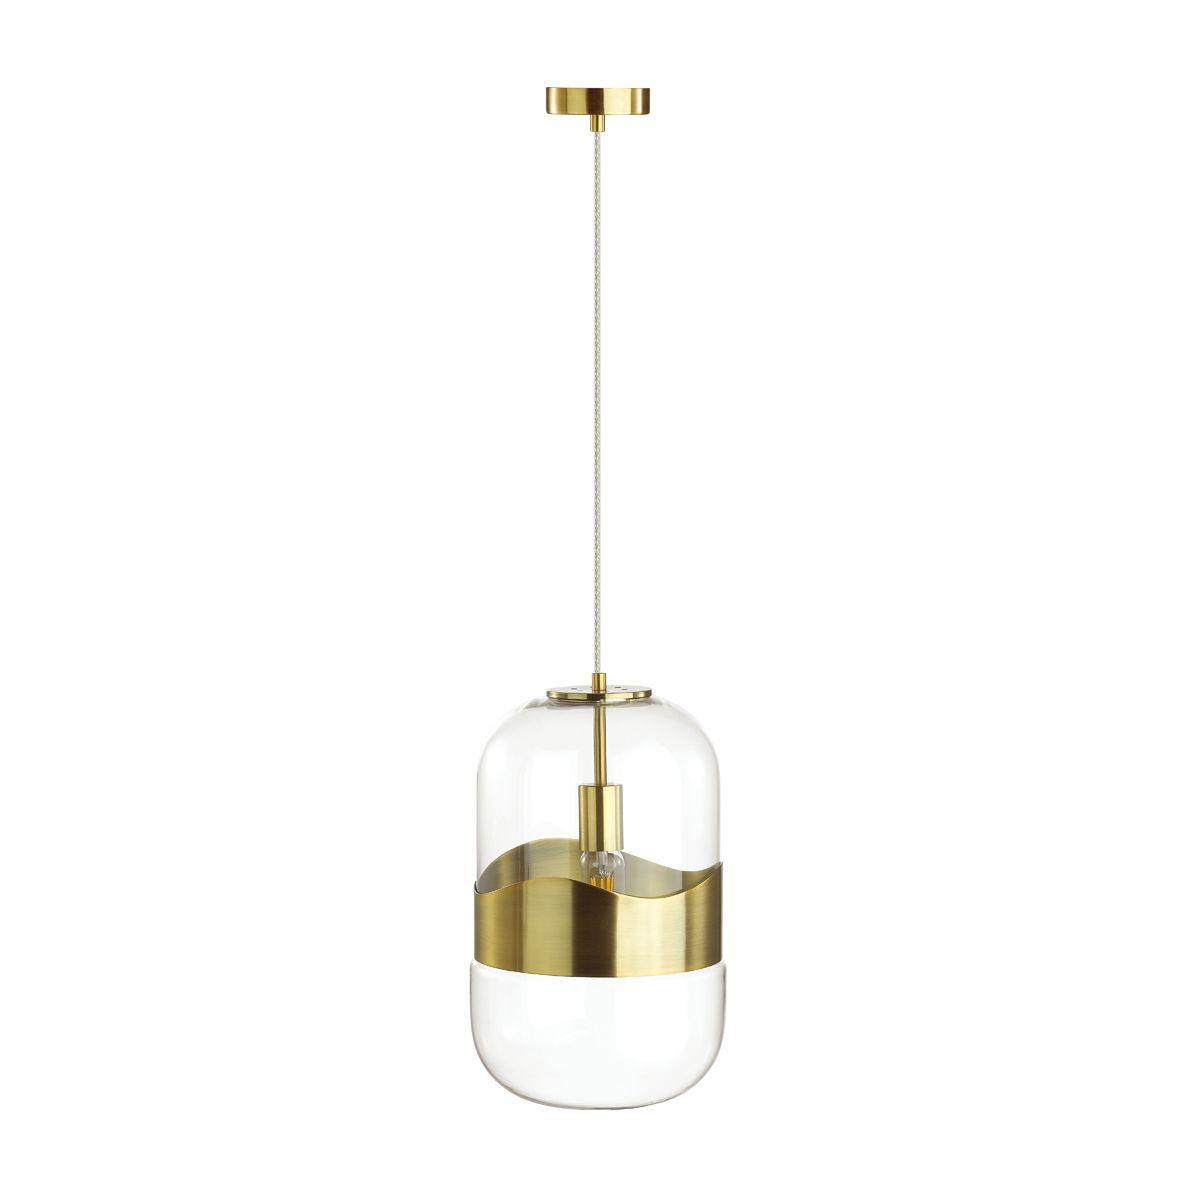 Светильник Odeon Light 4814/1 Pendant